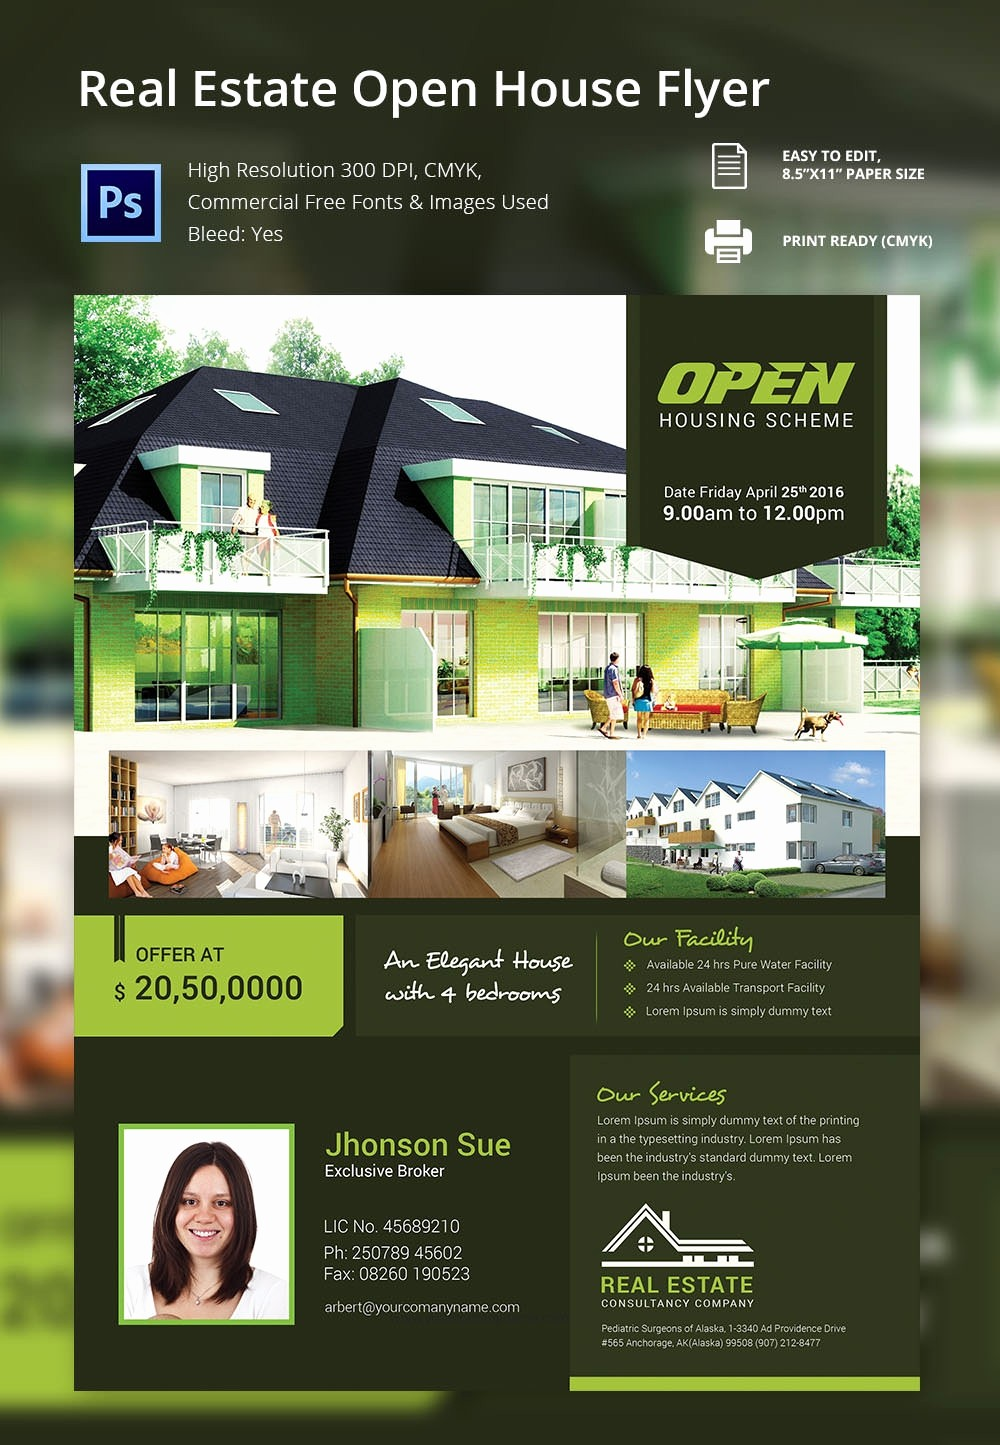 Business Open House Flyer Template Fresh Open House Flyer Template – 30 Free Psd format Download